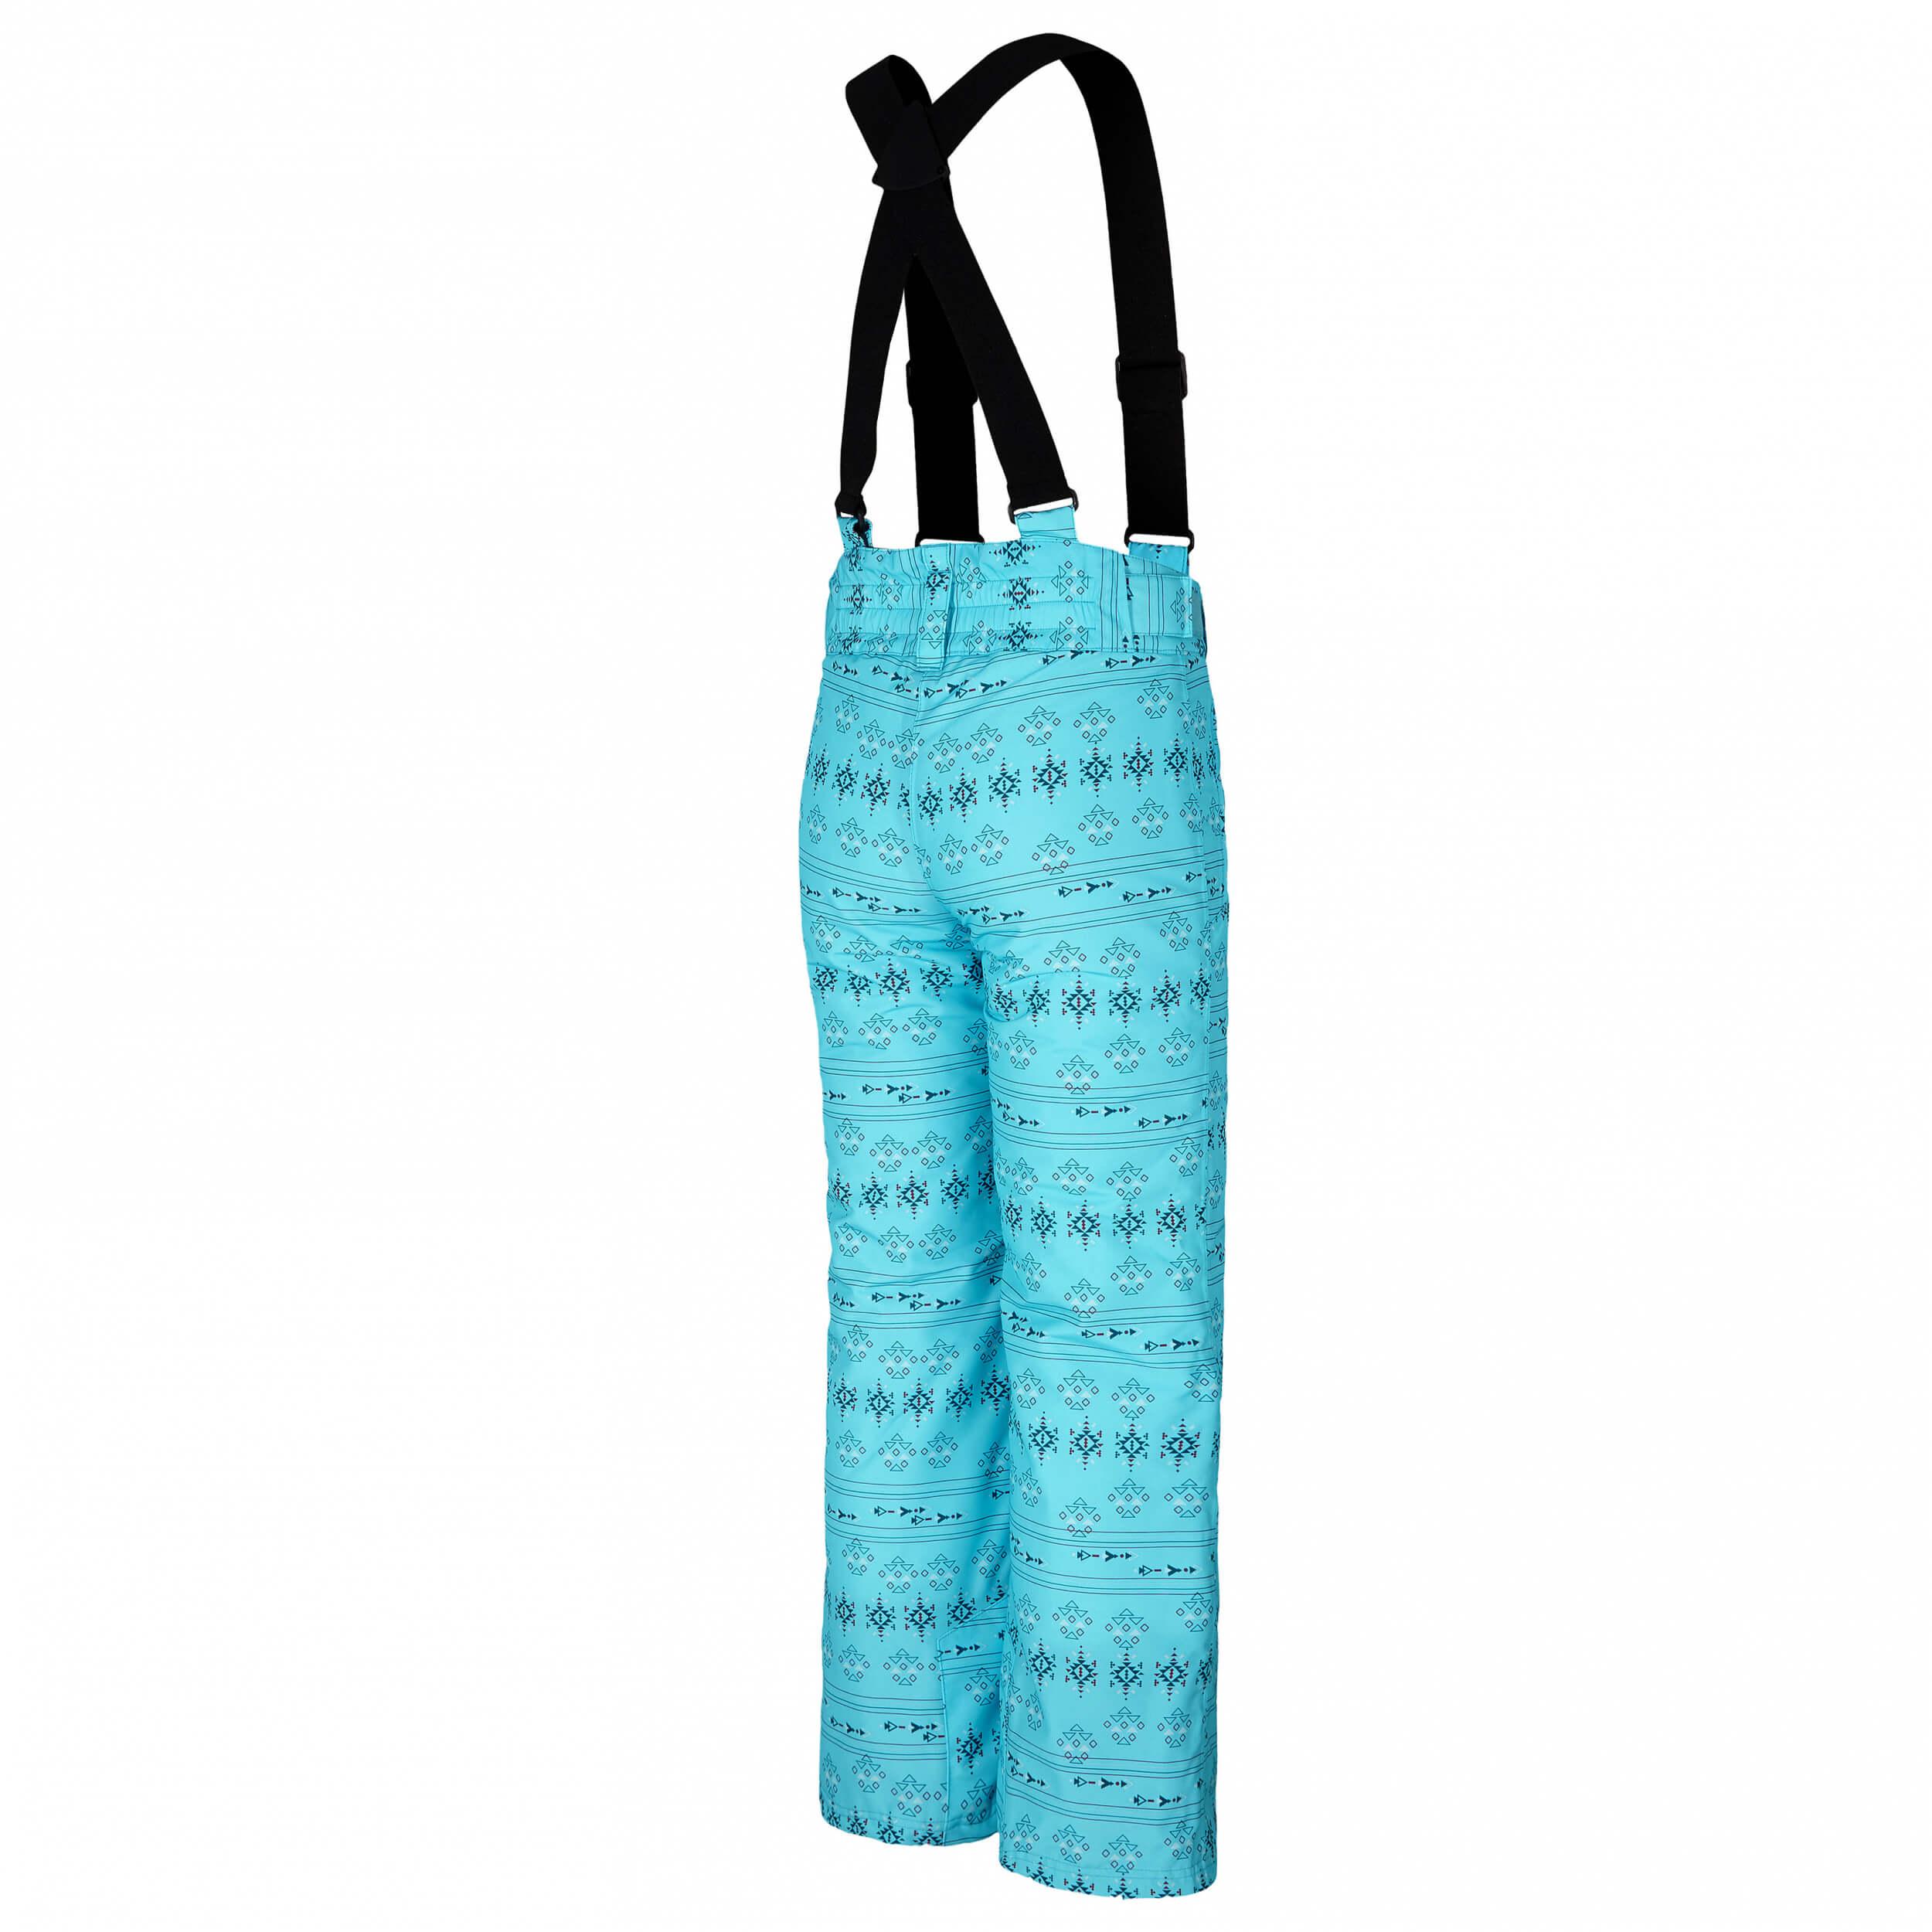 ZIENER Kinder Skihose AQUA SHIELD Avatine blau gemustert 280